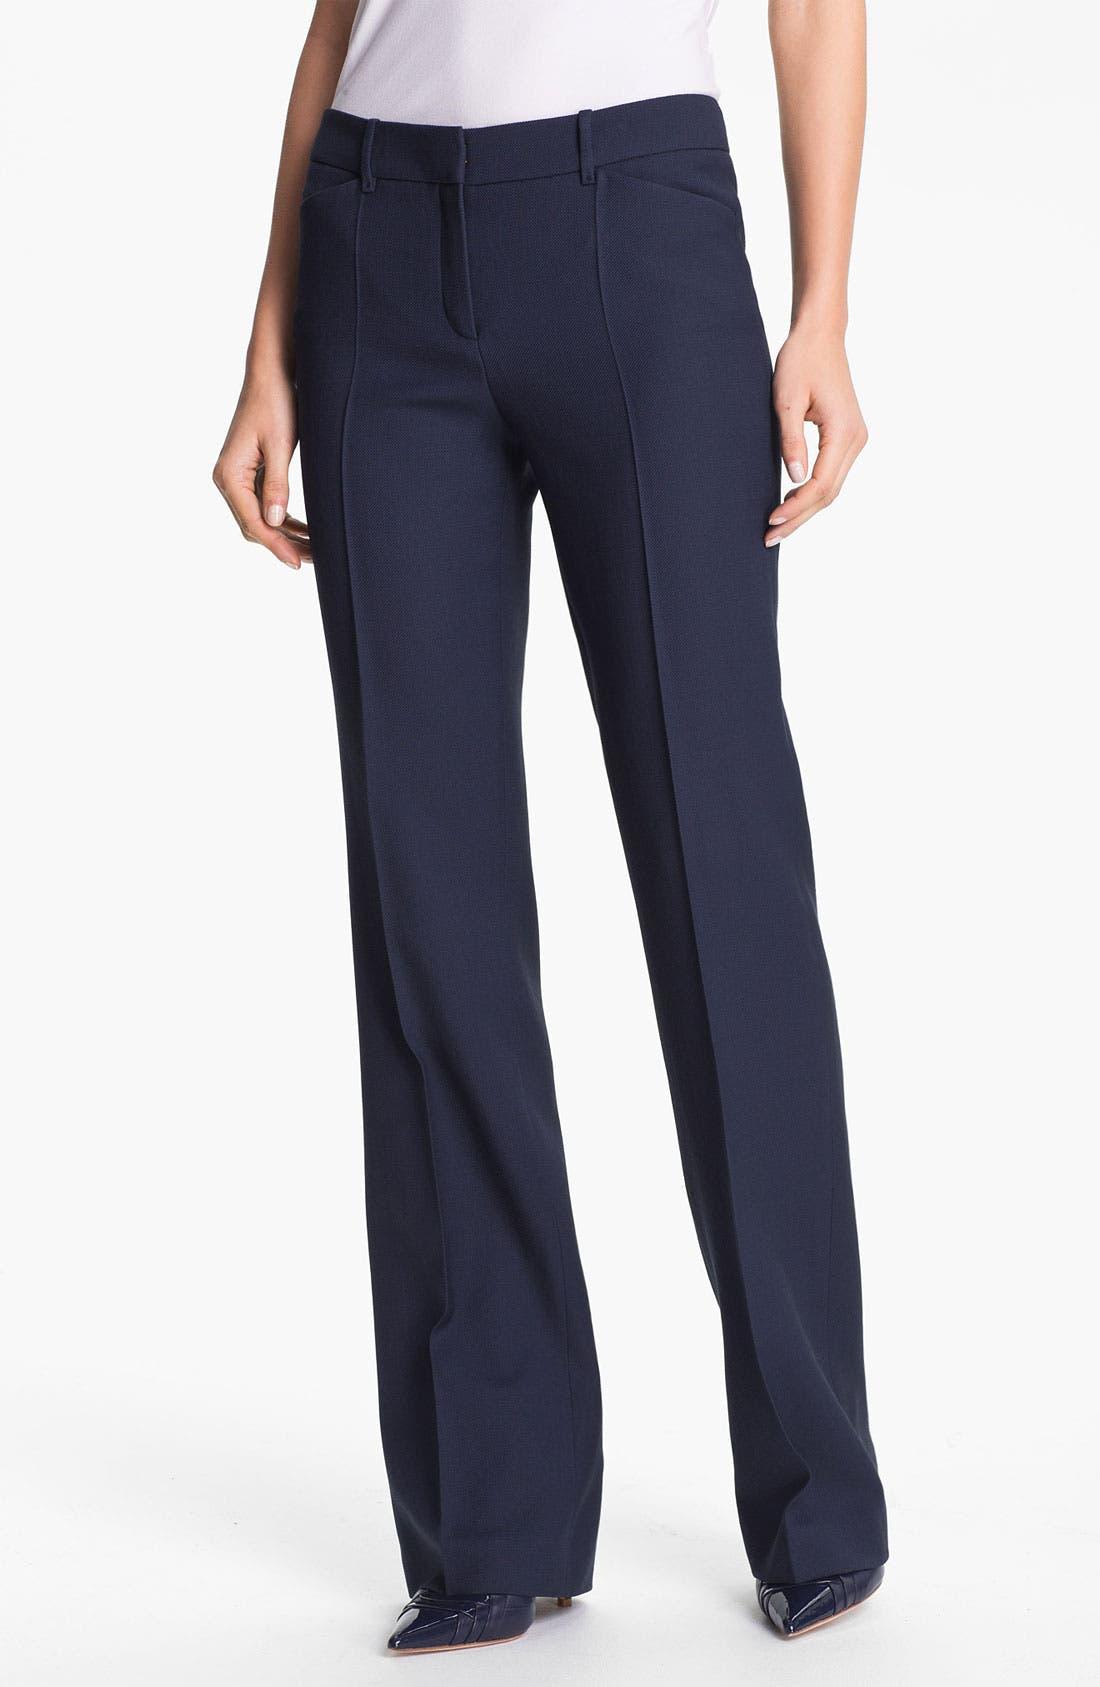 Alternate Image 1 Selected - BOSS Black 'Tuliasa' Wool Pants